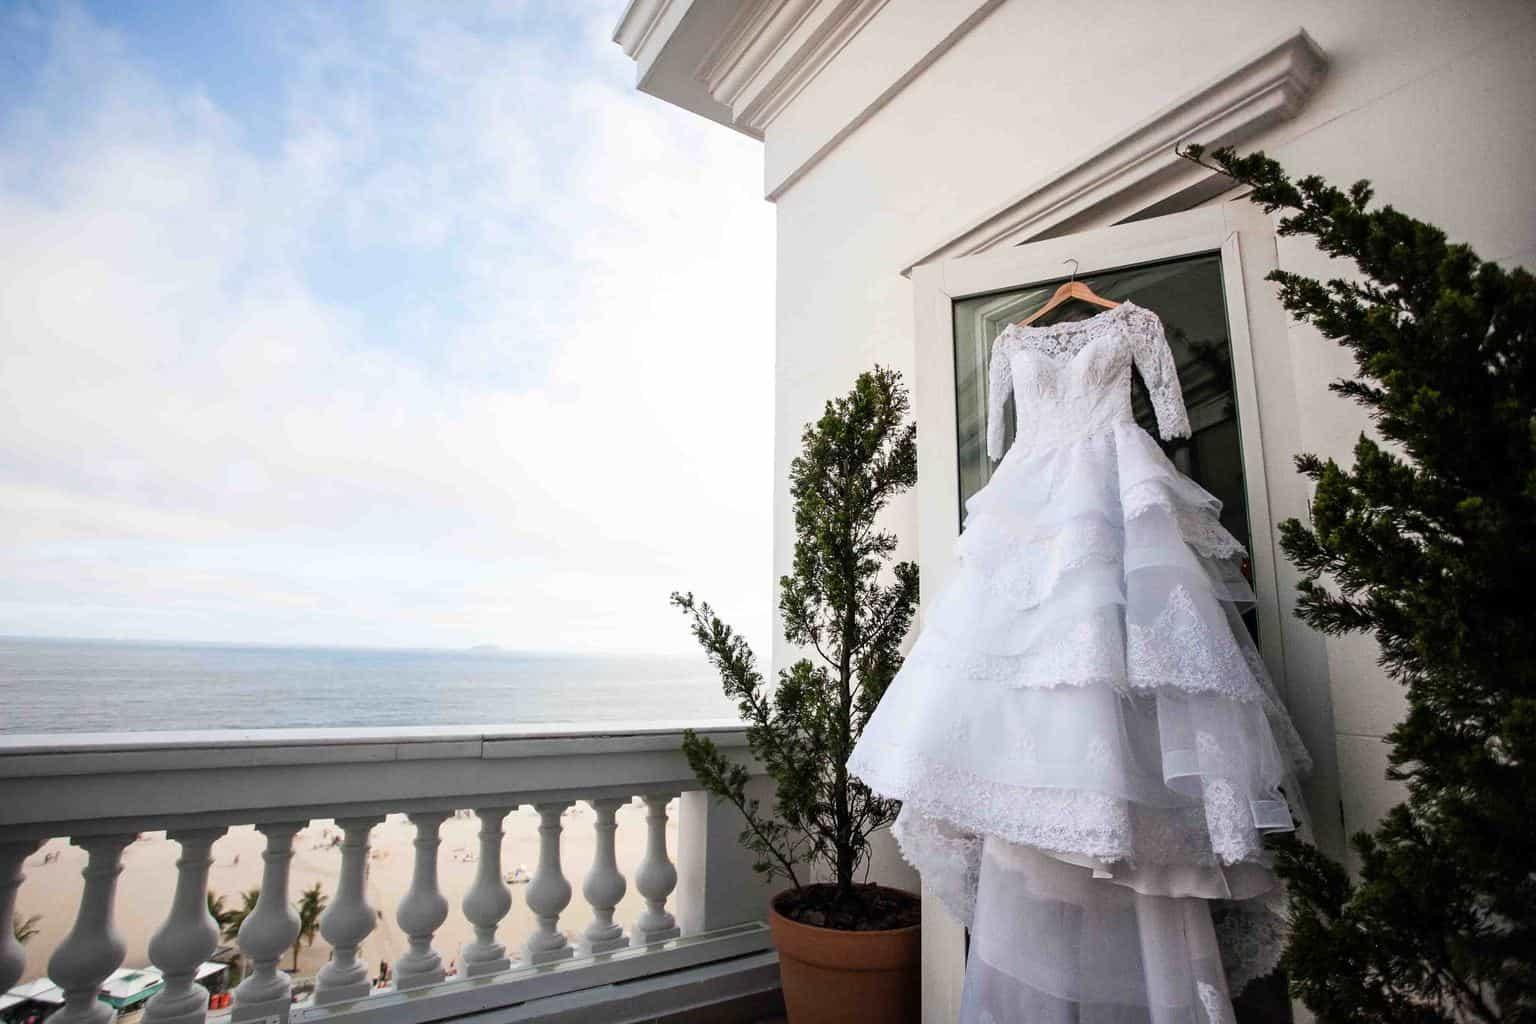 Casamento-Clássico-Casamento-tradicional-Copacabana-Palace-Making-of-Monica-Roias-Ribas-Foto-e-Vídeo-Sapato-Silvio-Cruz-Tuanny-e-Bernardo-Vestido-de-noiva-CaseMe